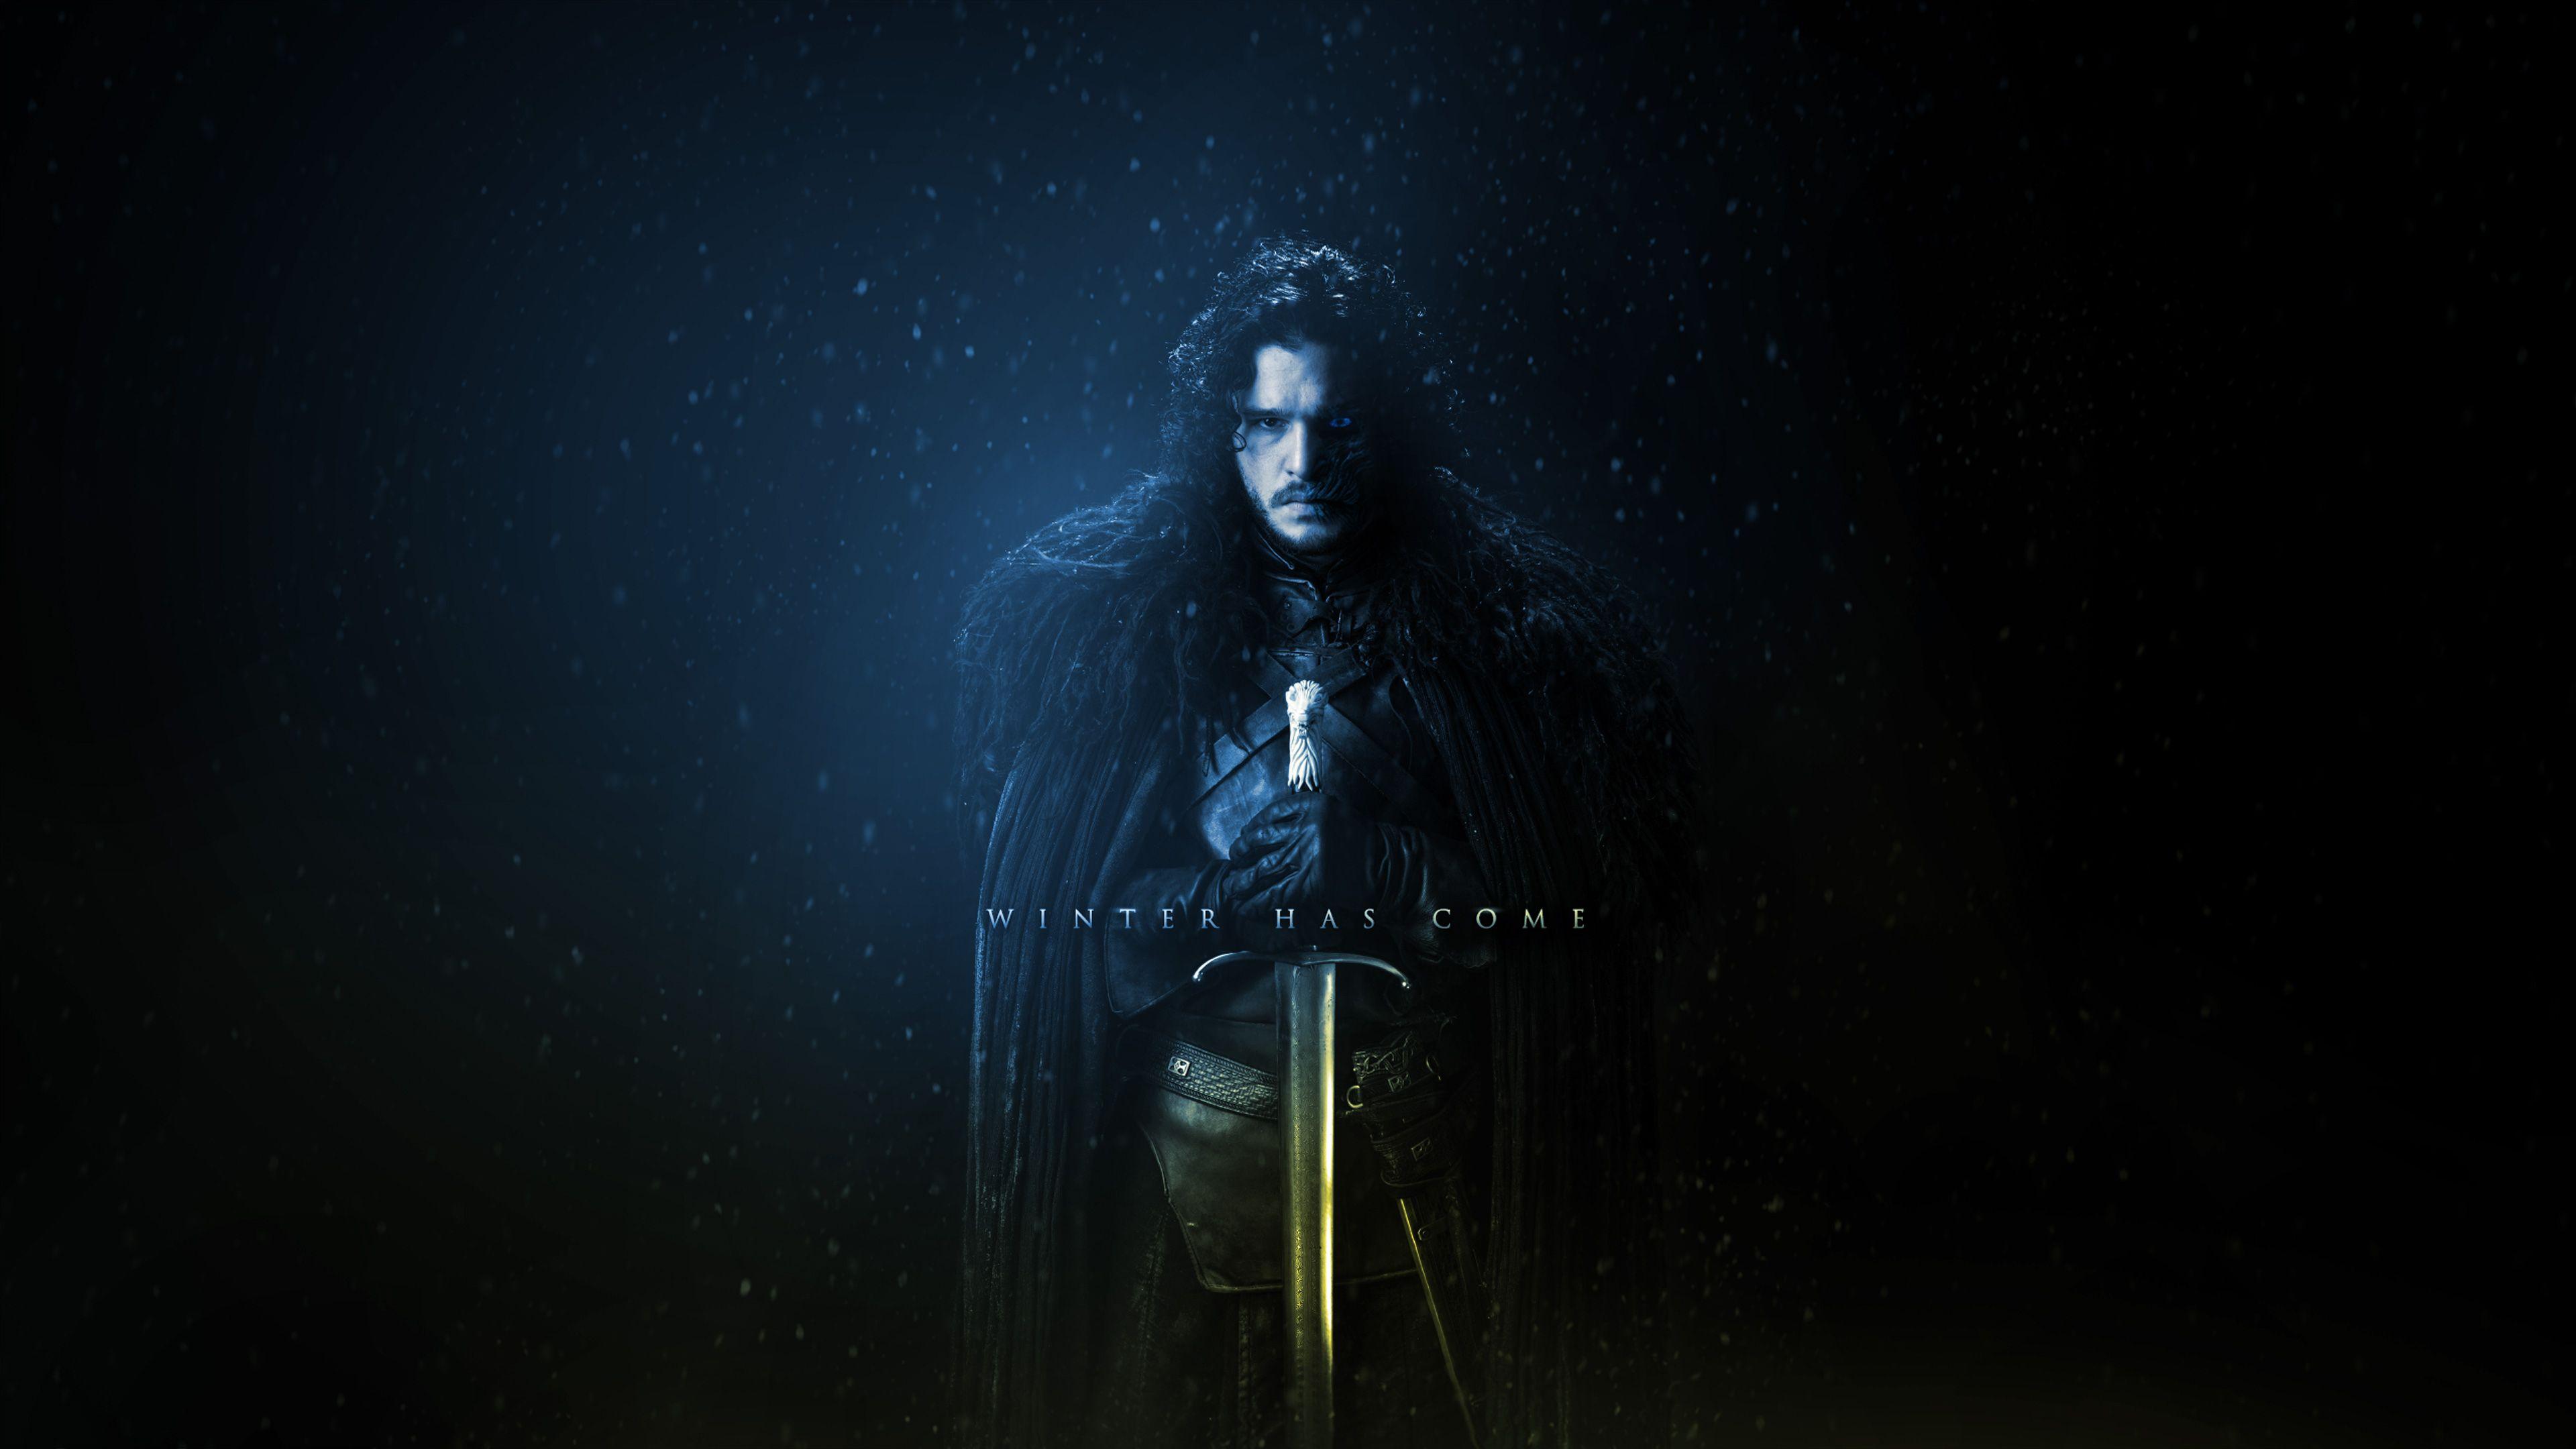 Game Of Thrones Season 7 Jon Snow Wallpaper 4K Wallpaper Game 3840x2160